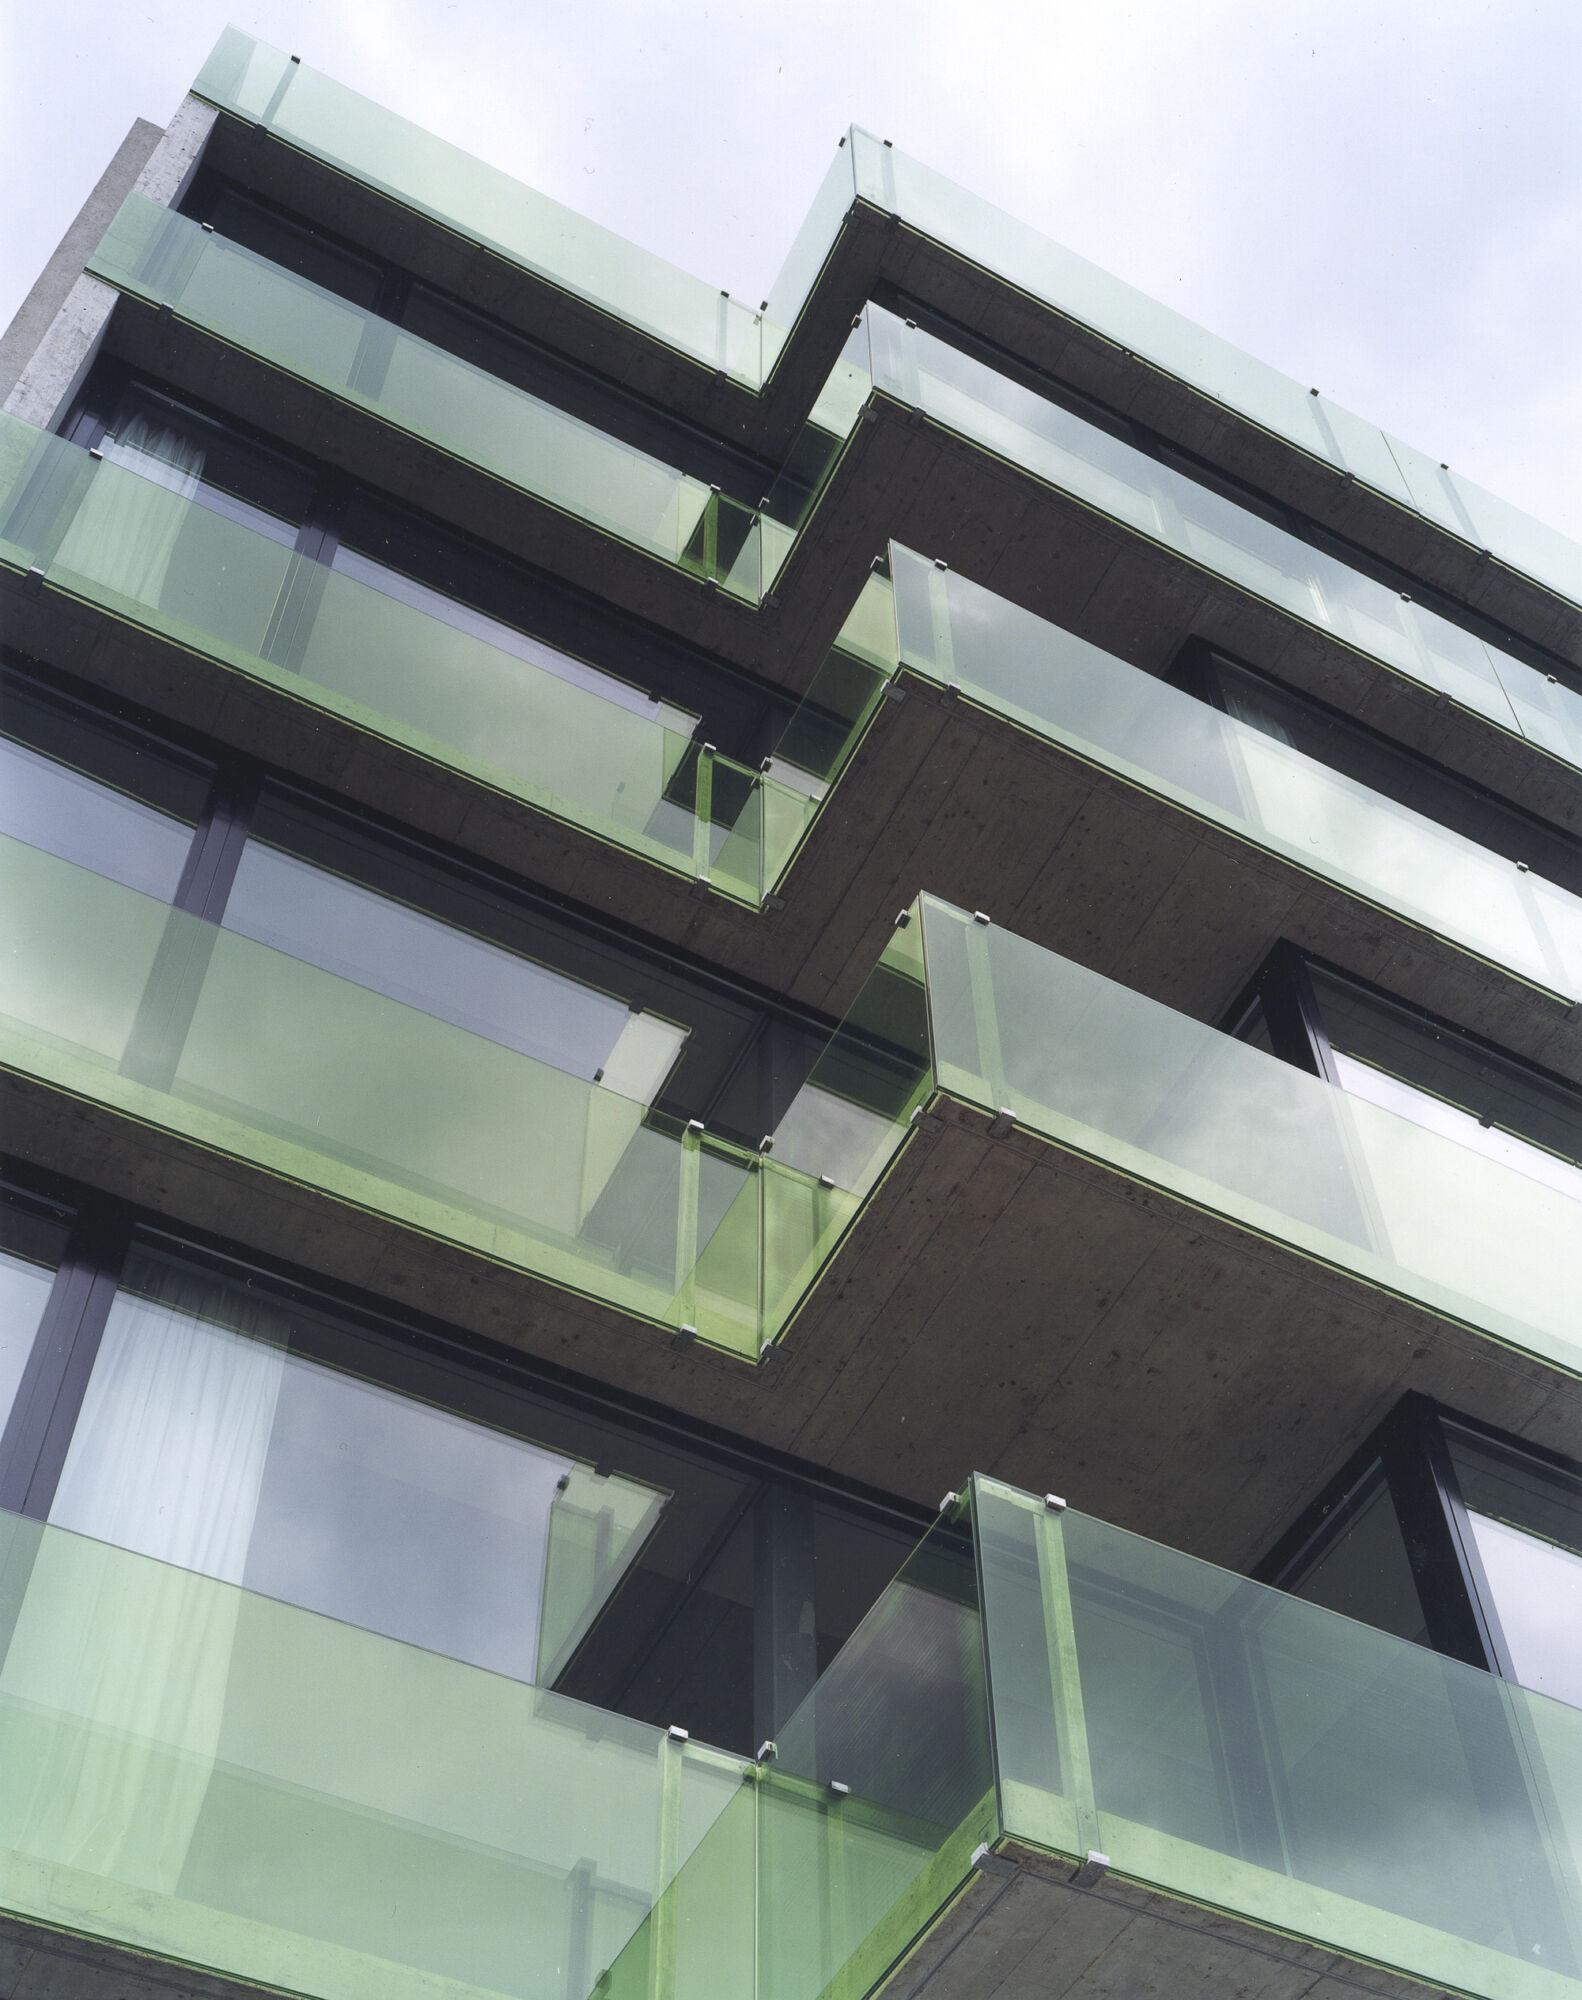 Loft House Basel on